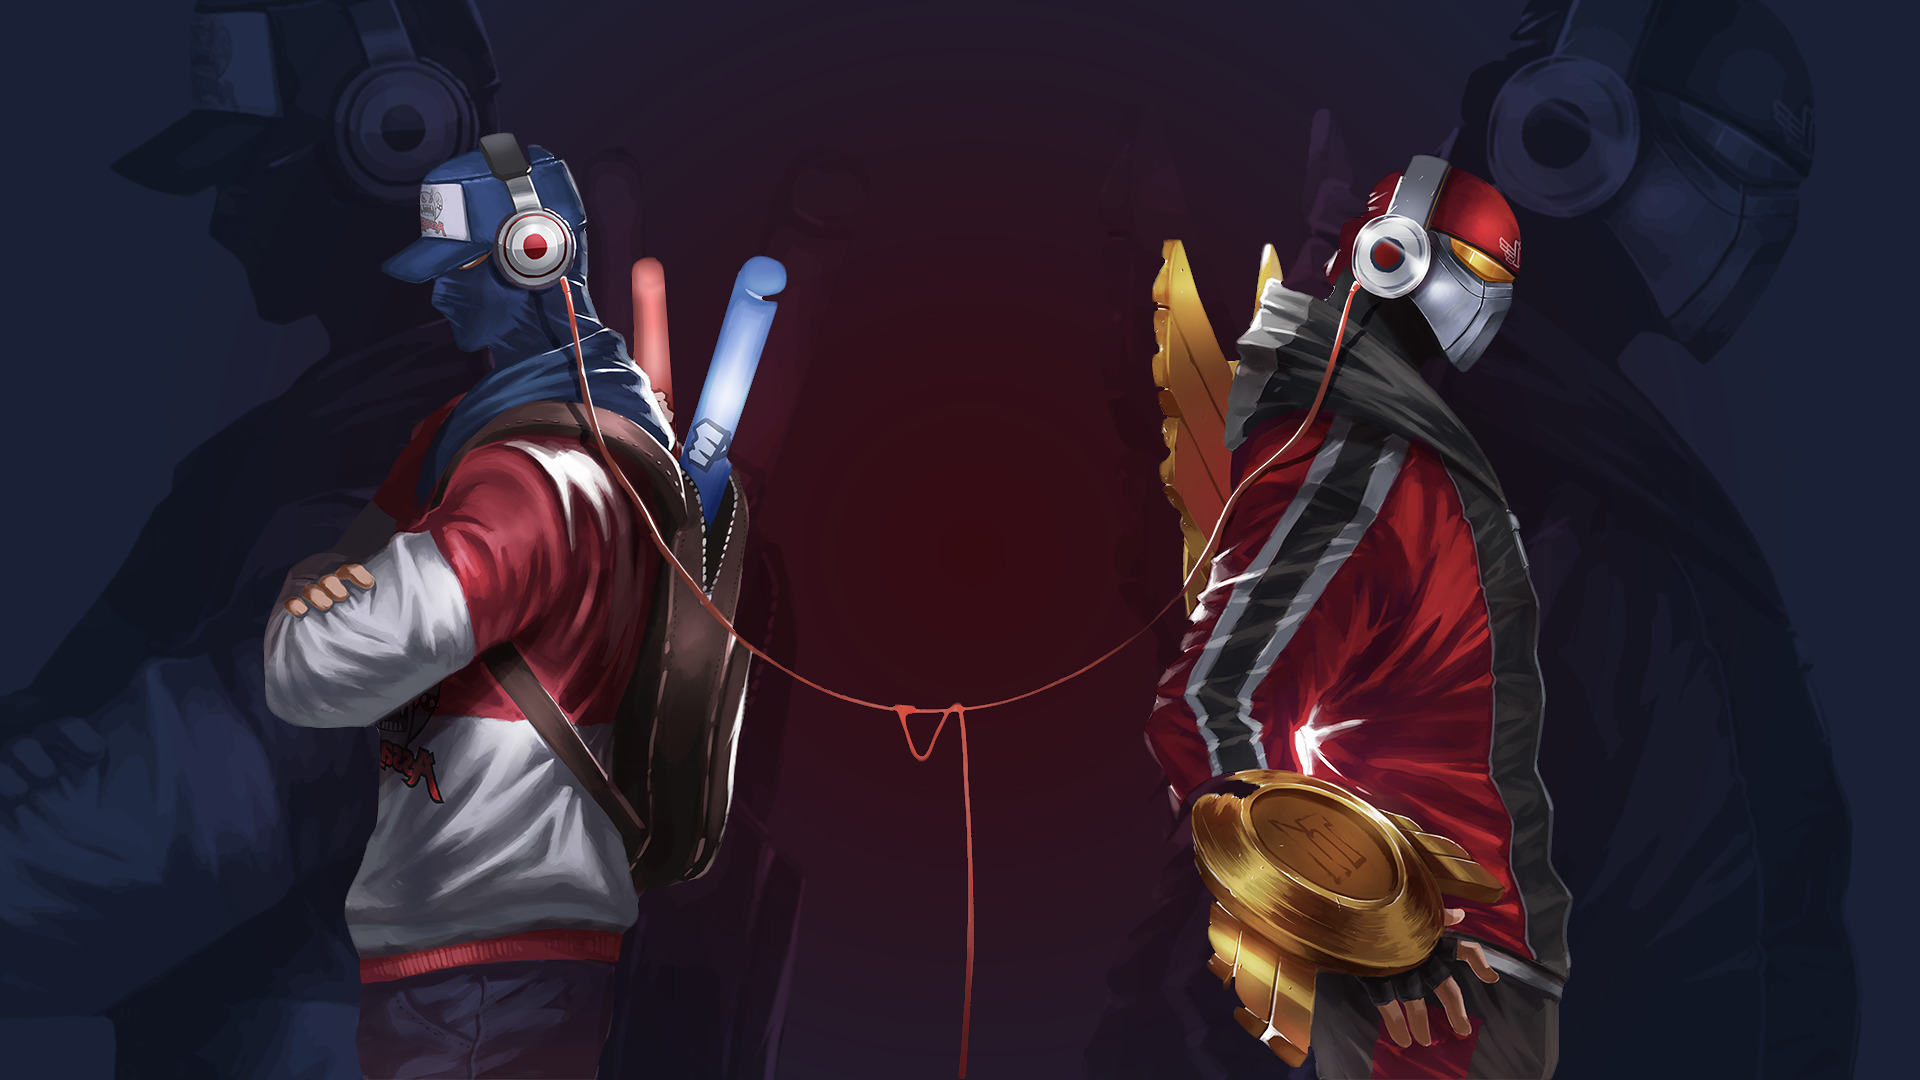 League Of Legends Animated Wallpaper Windows 10 Zed League Of Legends Shen League Of Legends Skt T1